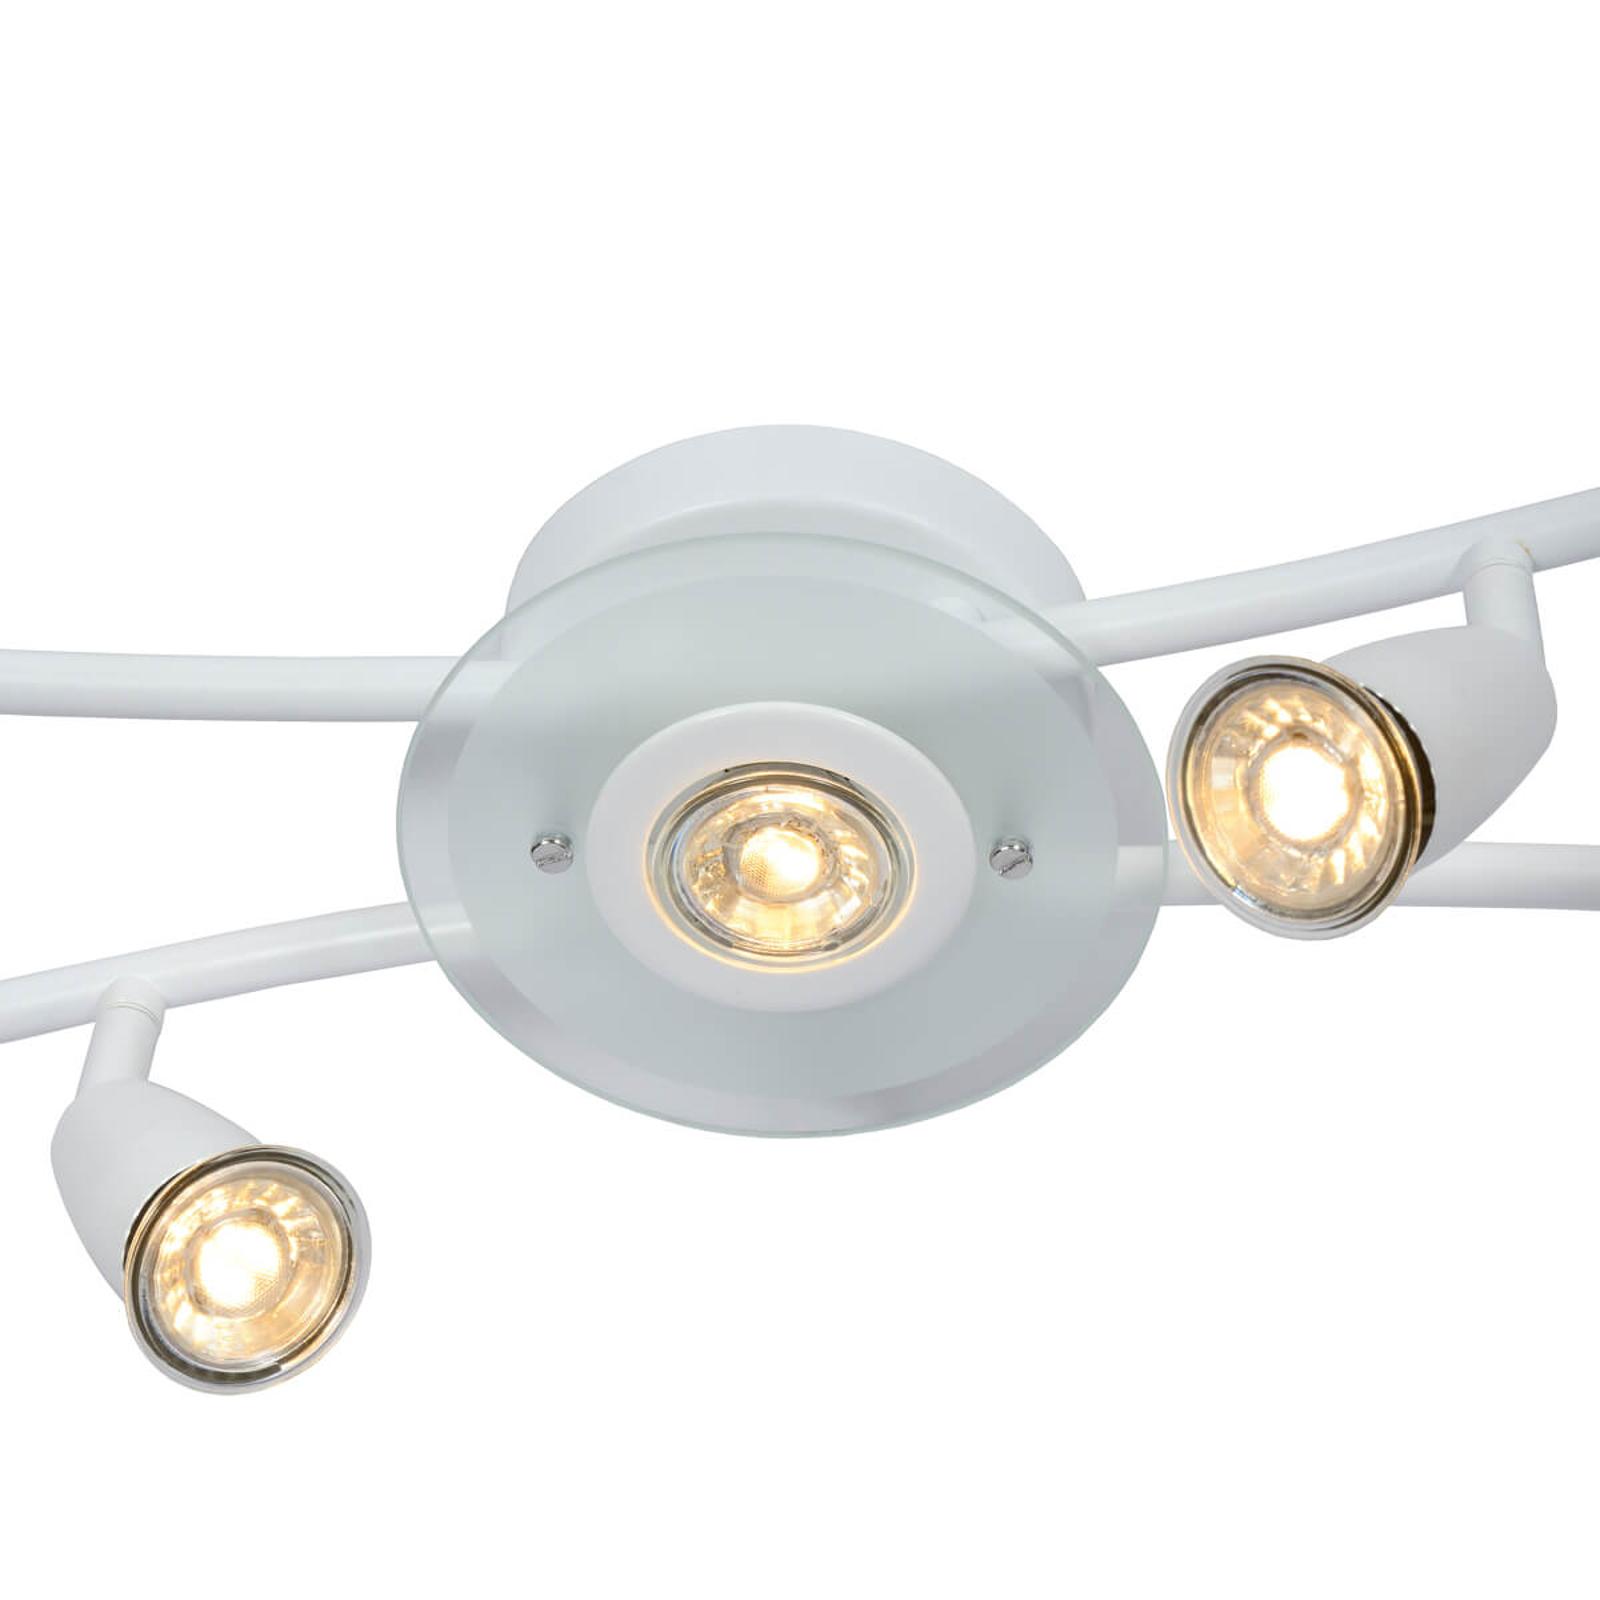 Regulowana lampa sufitowa LED Bingo, biała